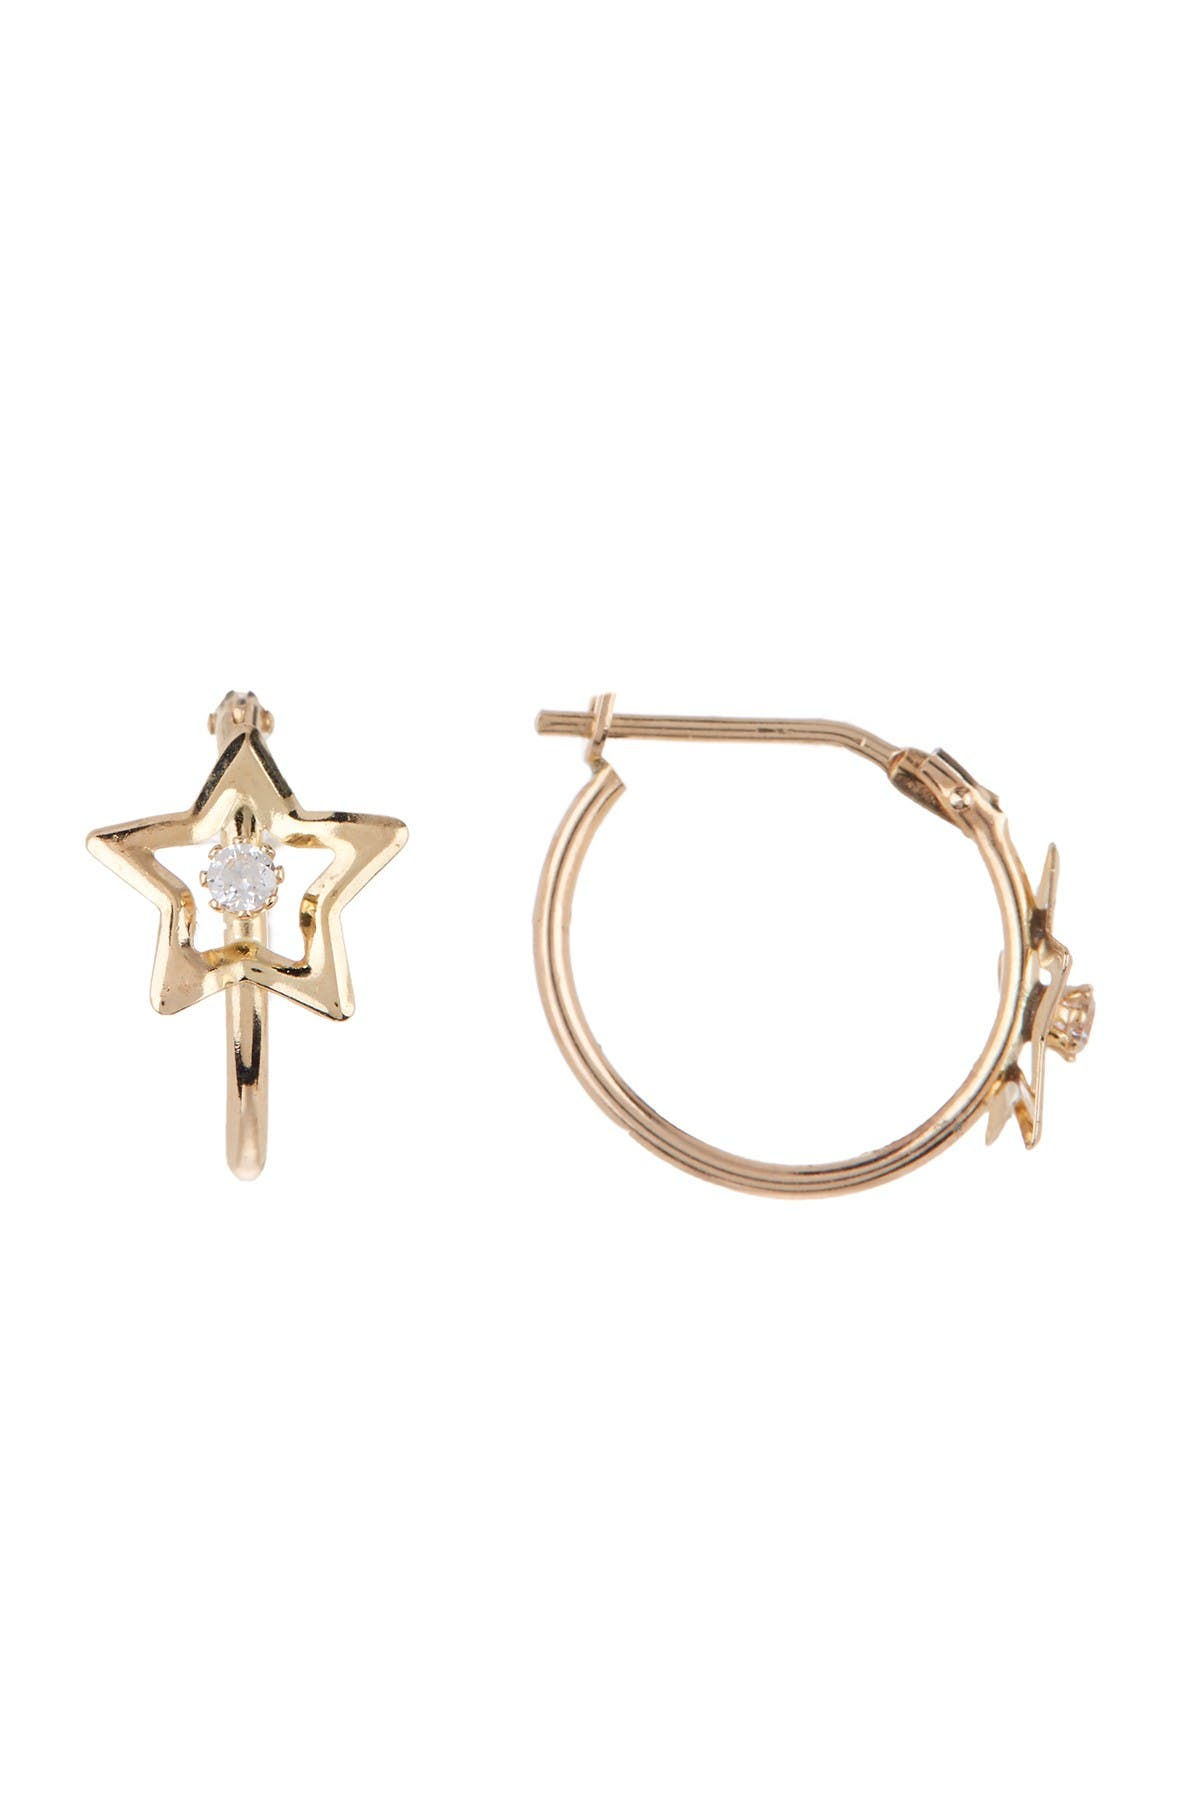 Image of Candela 10K Yellow Gold CZ Star Hoop Earrings